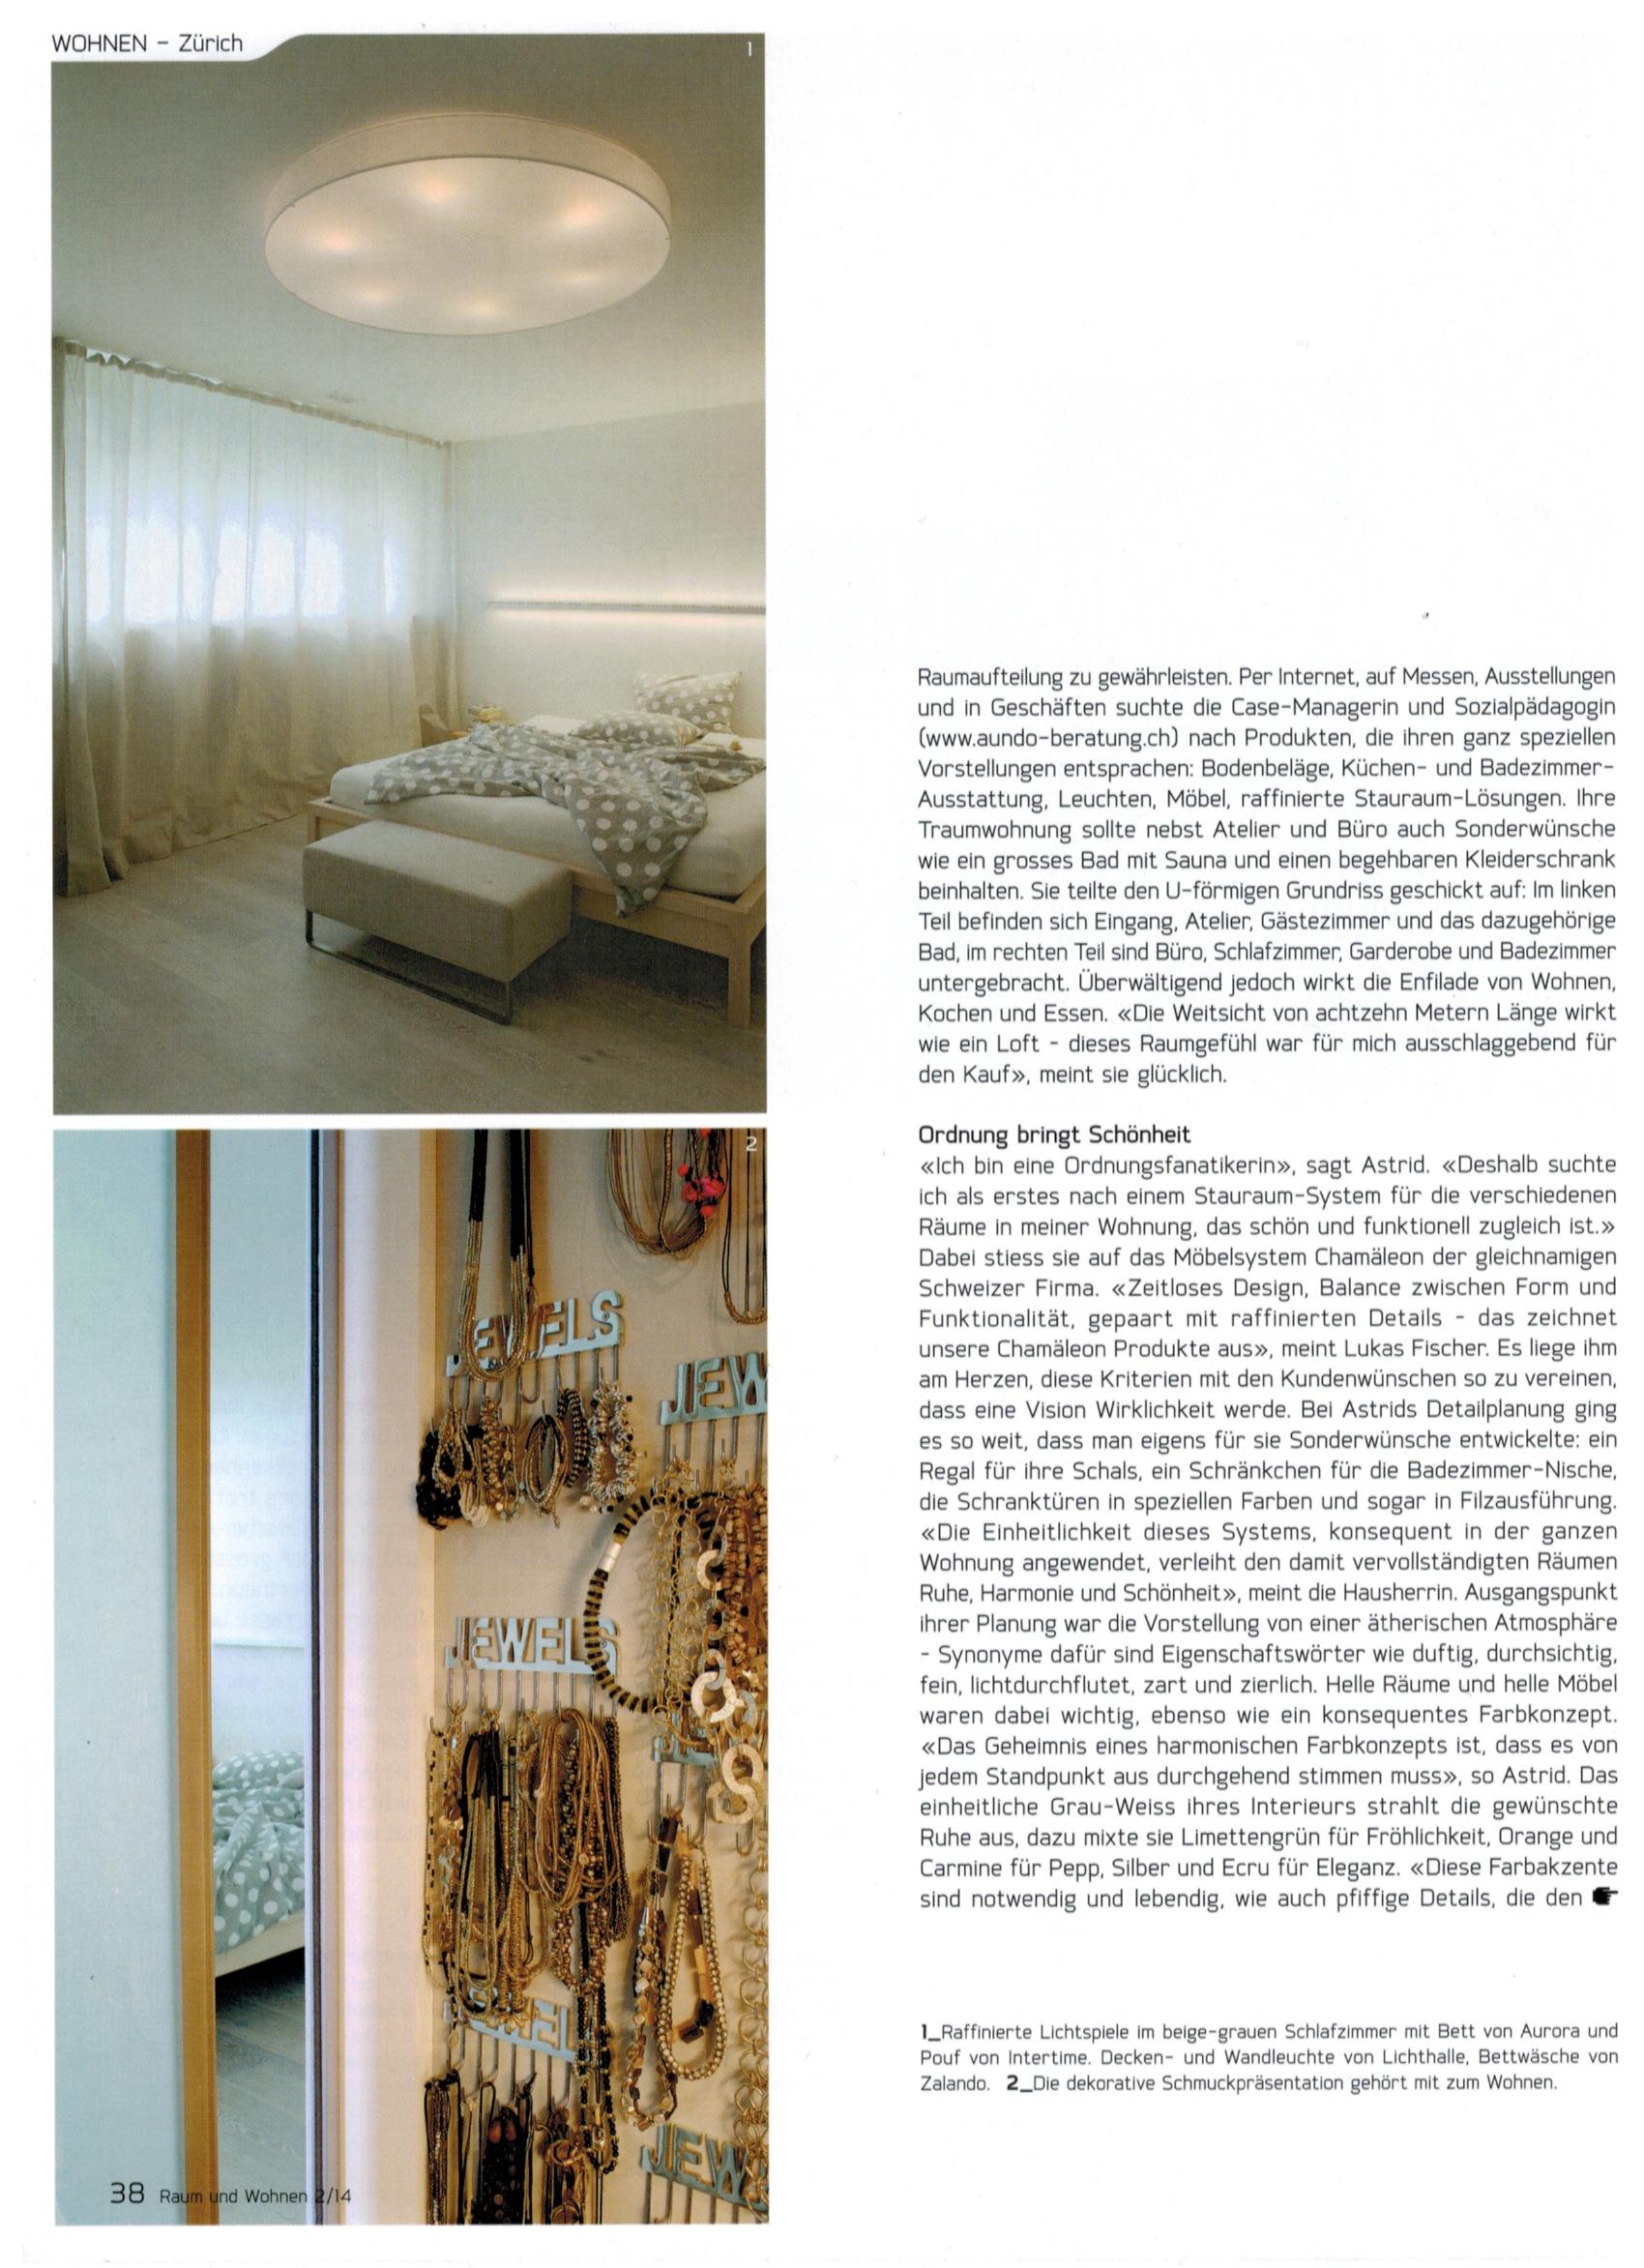 Seite38